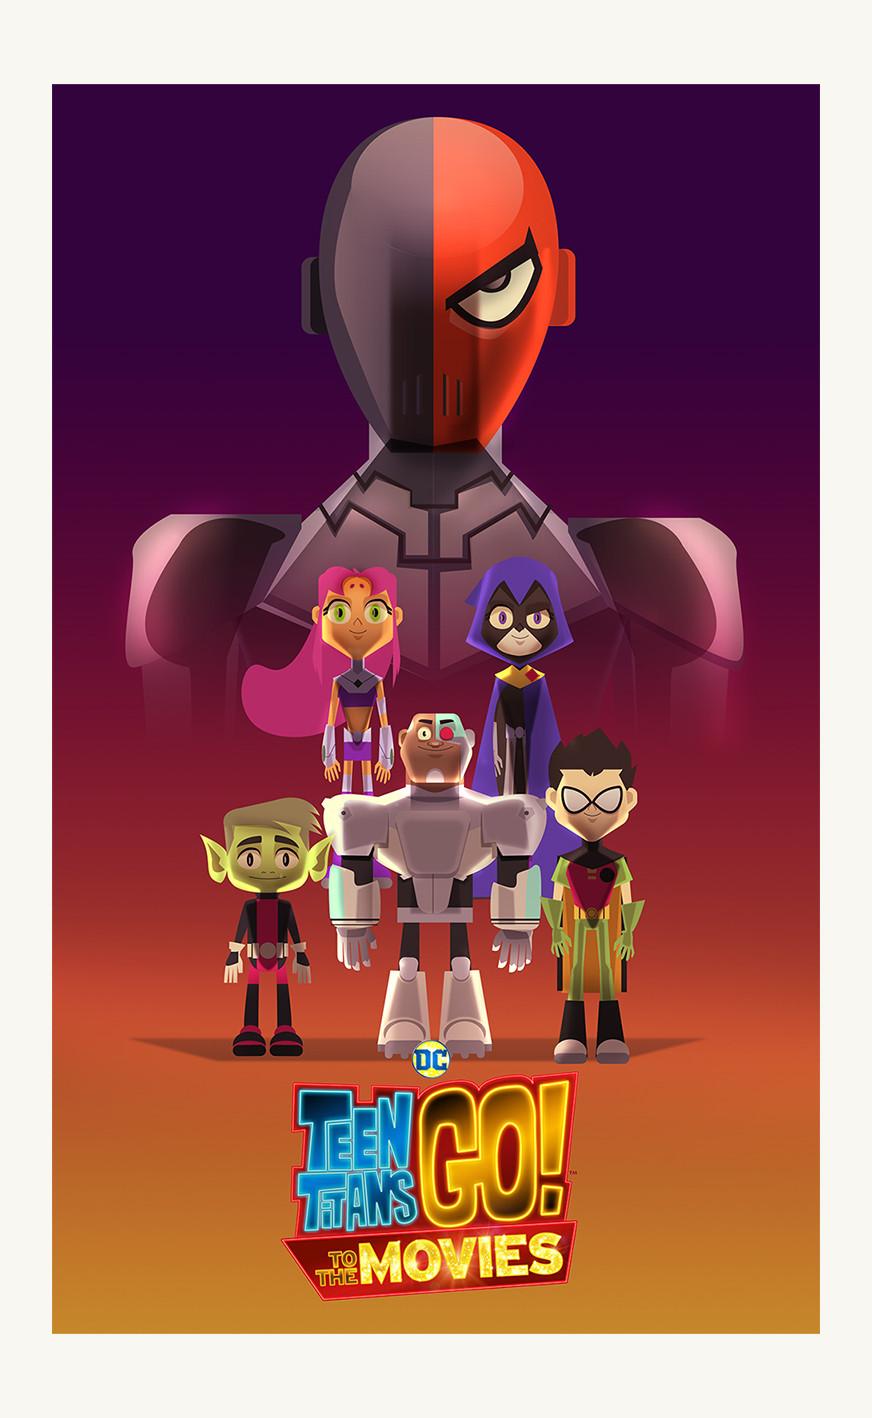 Seems The teen titans movie similar